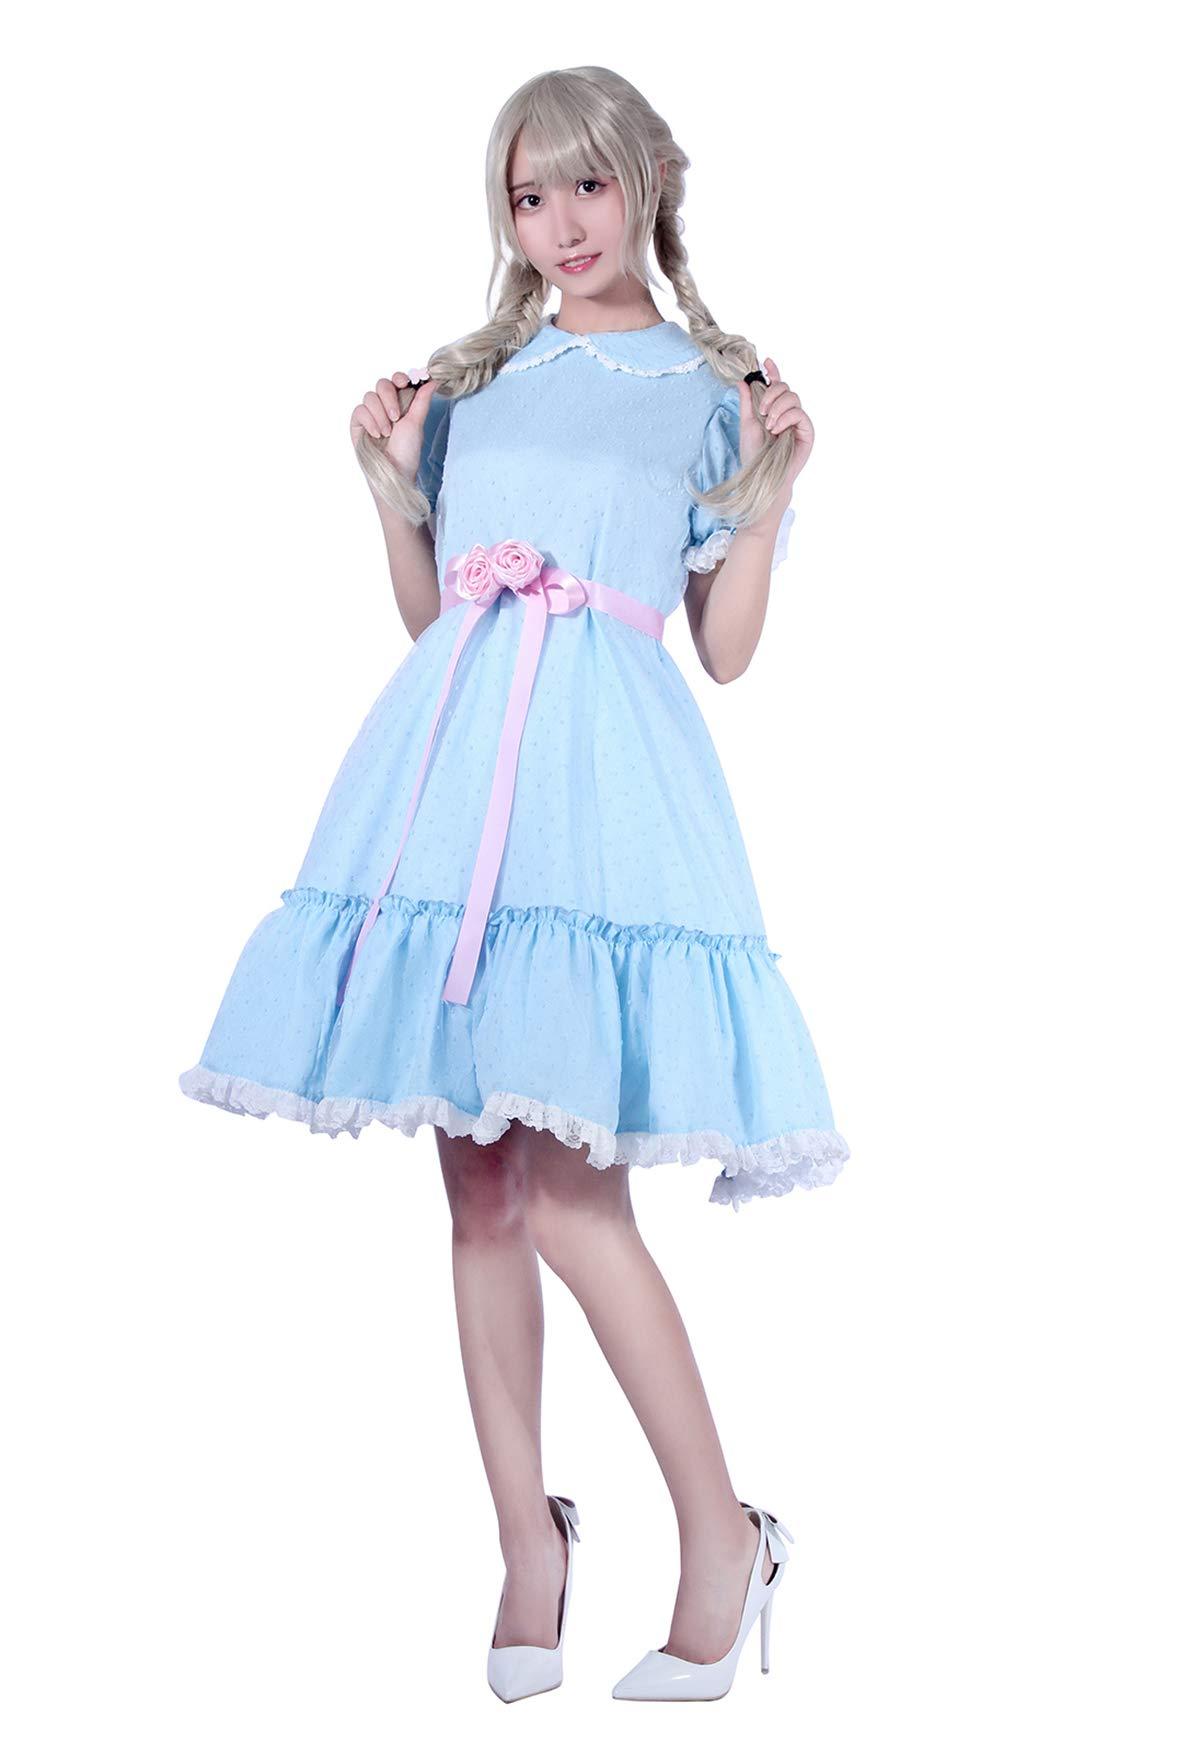 Women's Sweet Lolita Dress Blue Cotton Bow Puff Skirts Halloween Costumes